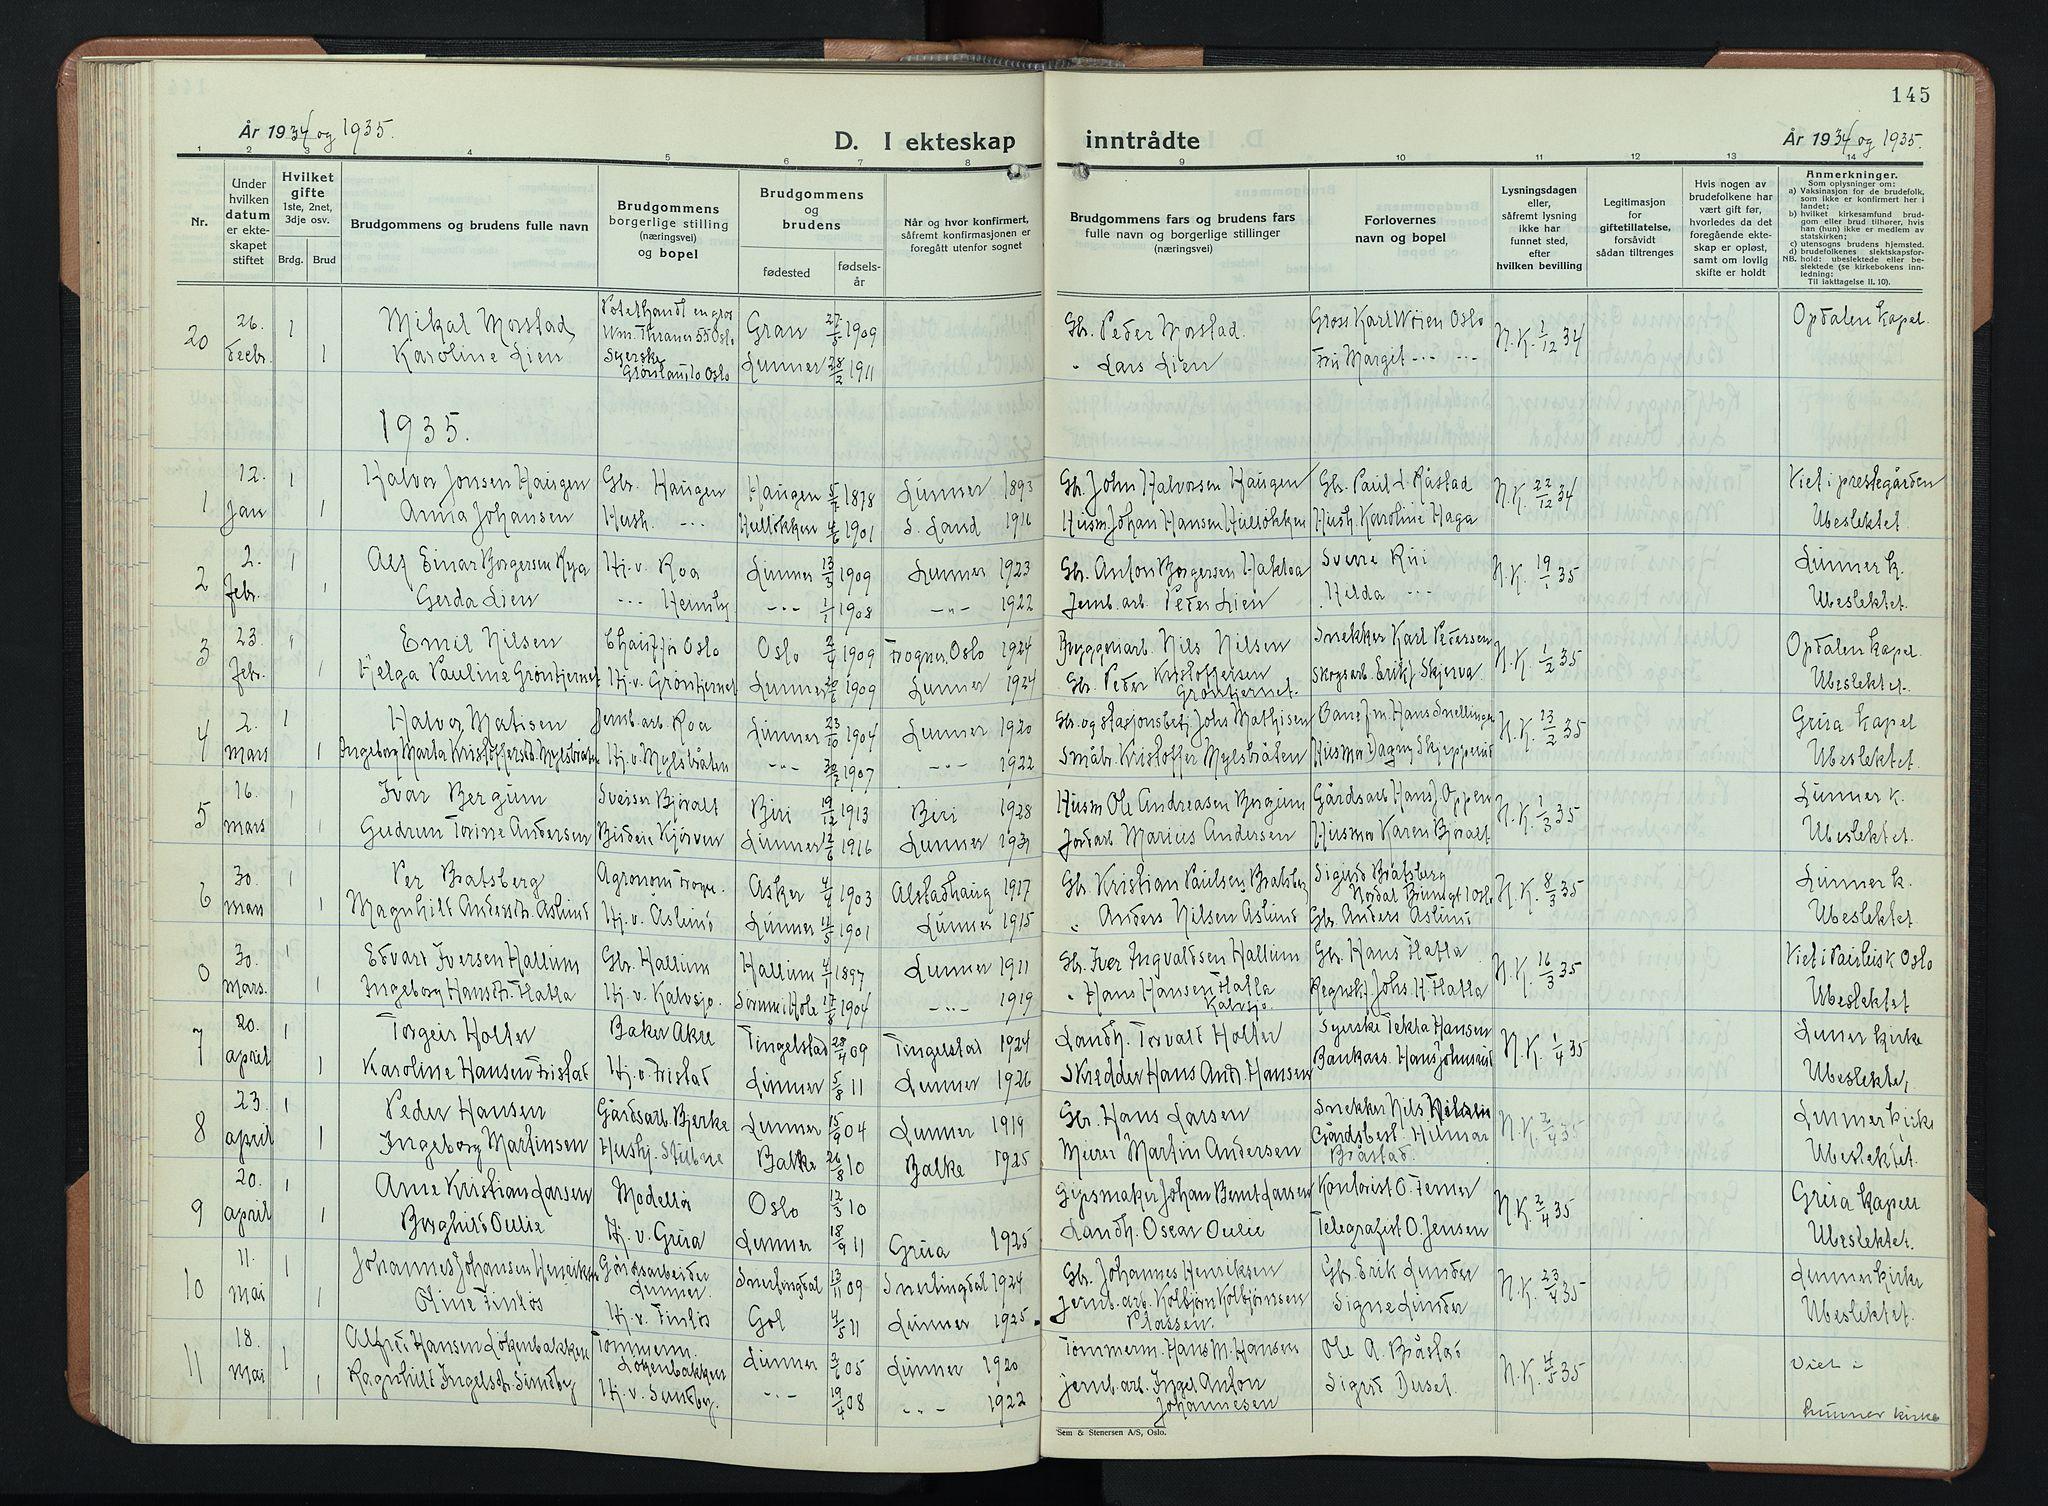 SAH, Lunner prestekontor, H/Ha/Hab/L0003: Klokkerbok nr. 3, 1933-1945, s. 145